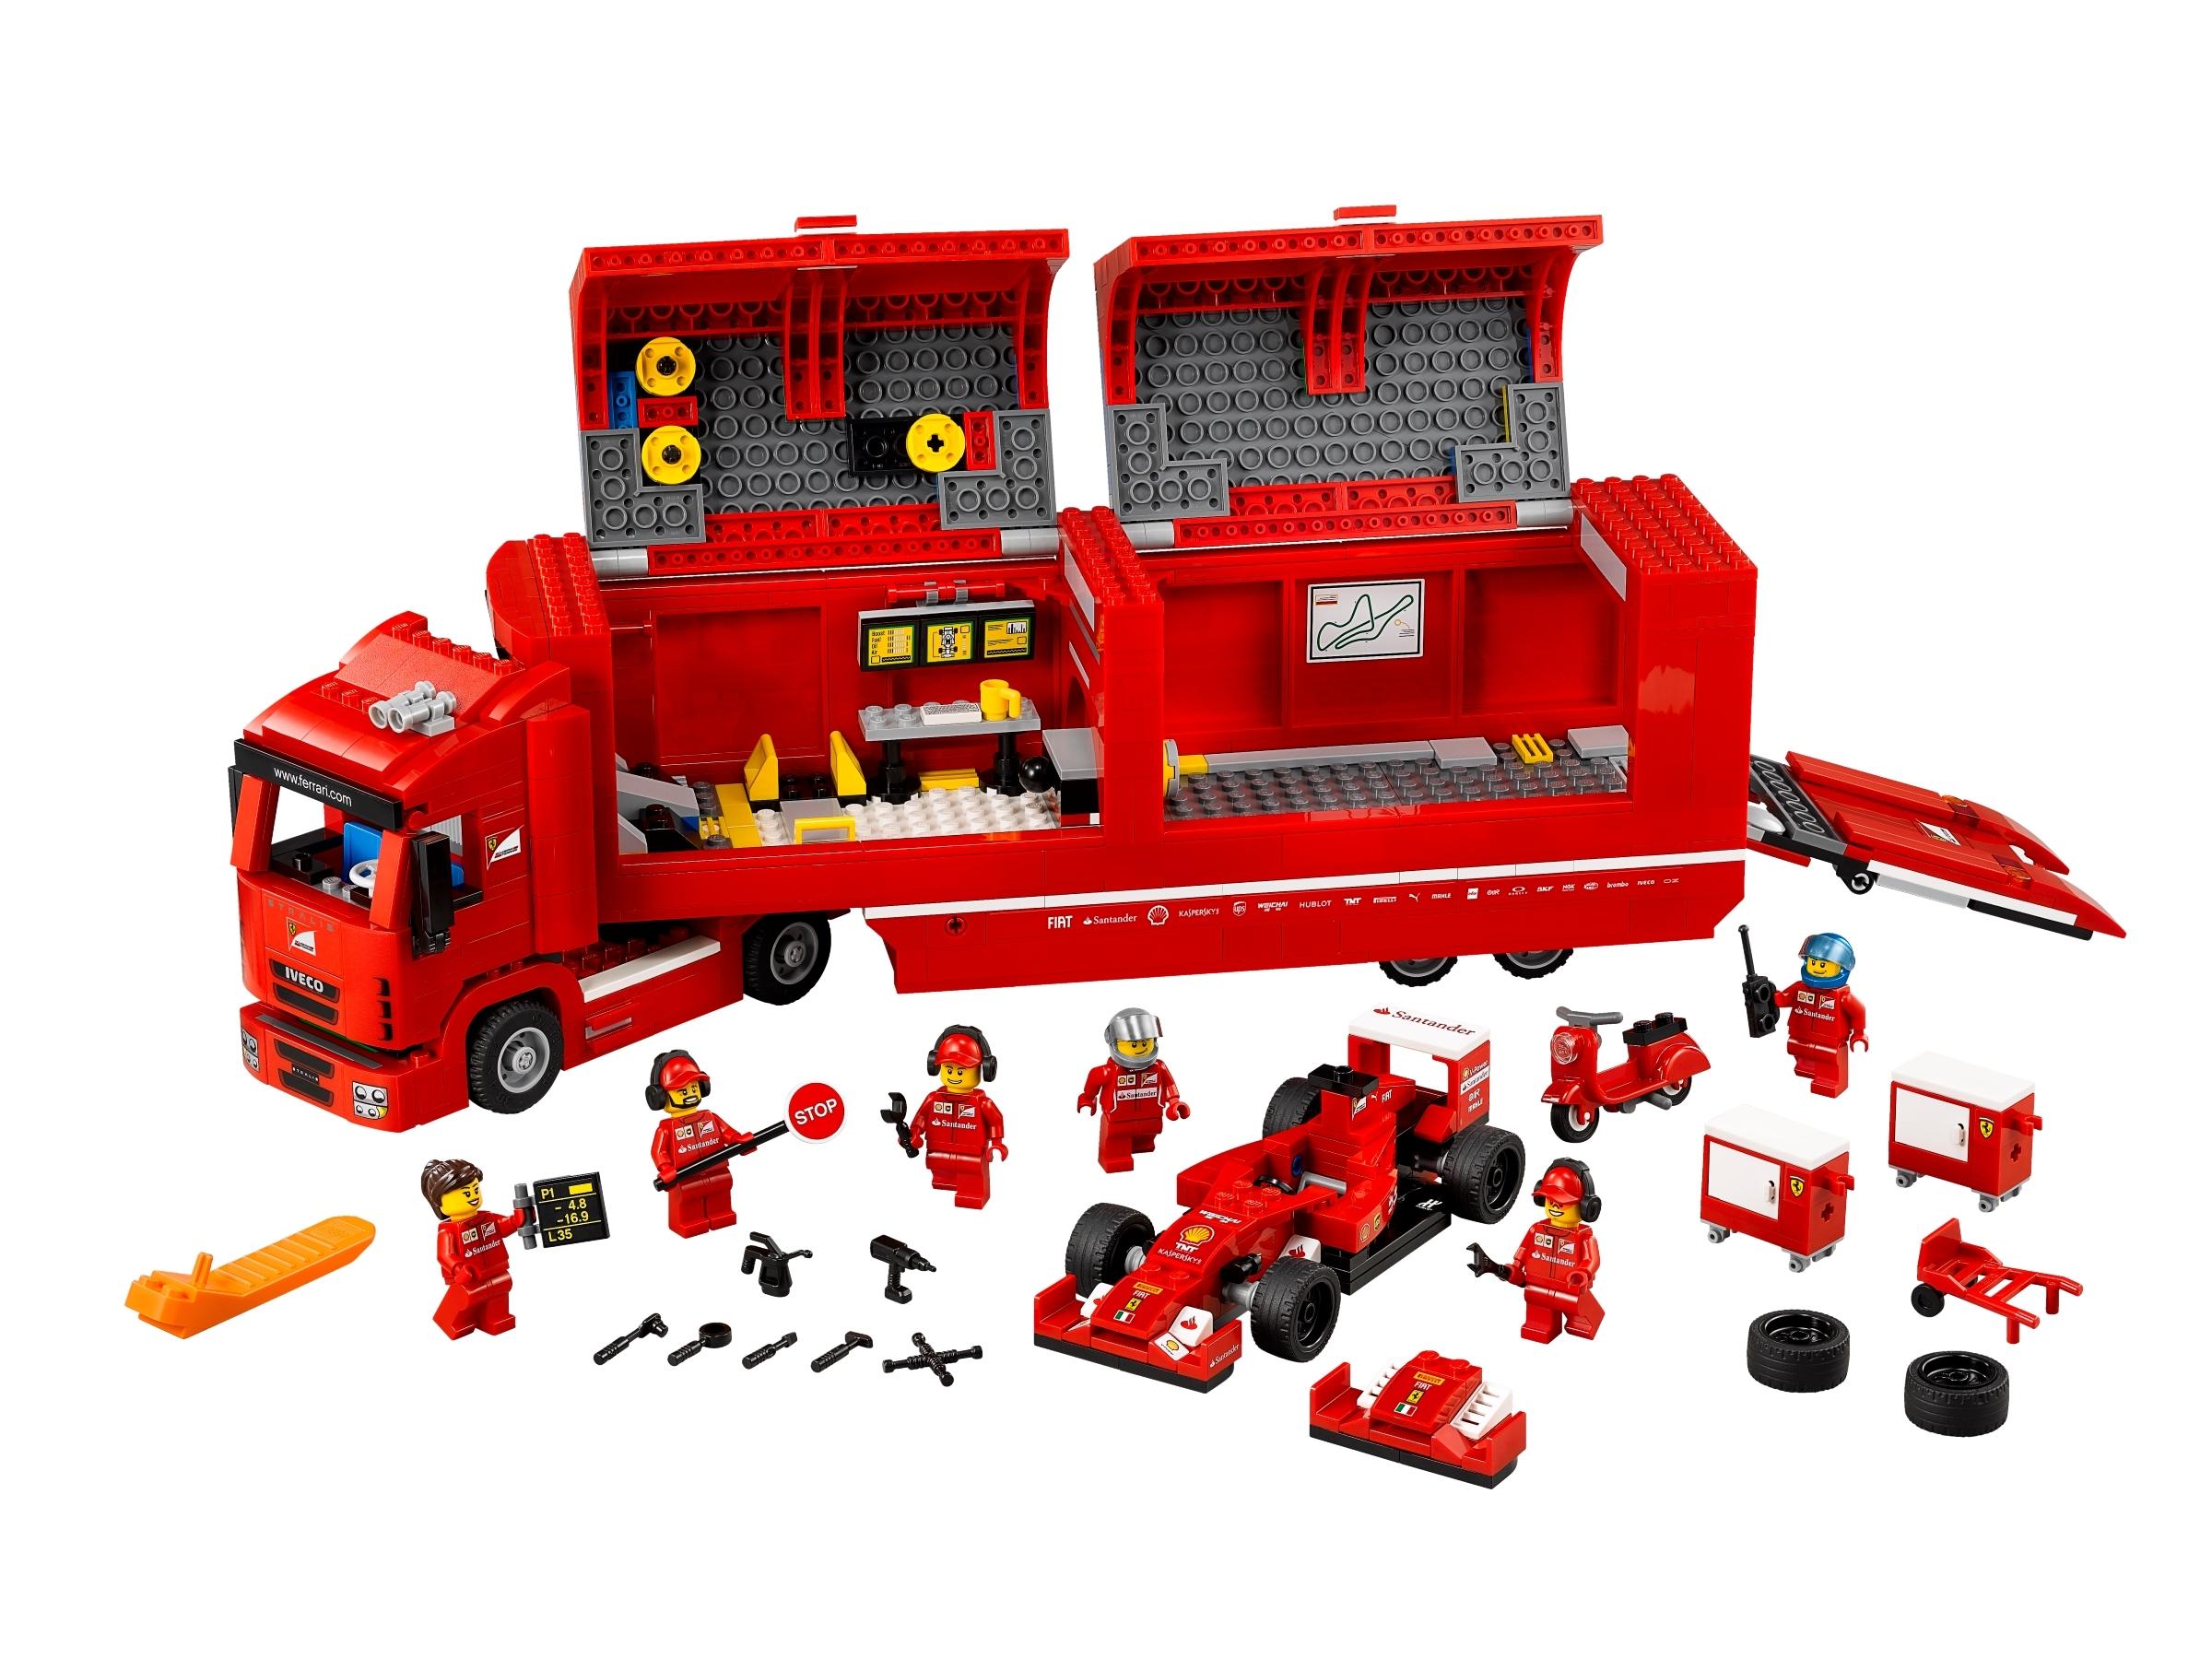 F14 T Scuderia Ferrari Truck 75913 Speed Champions Buy Online At The Official Lego Shop De